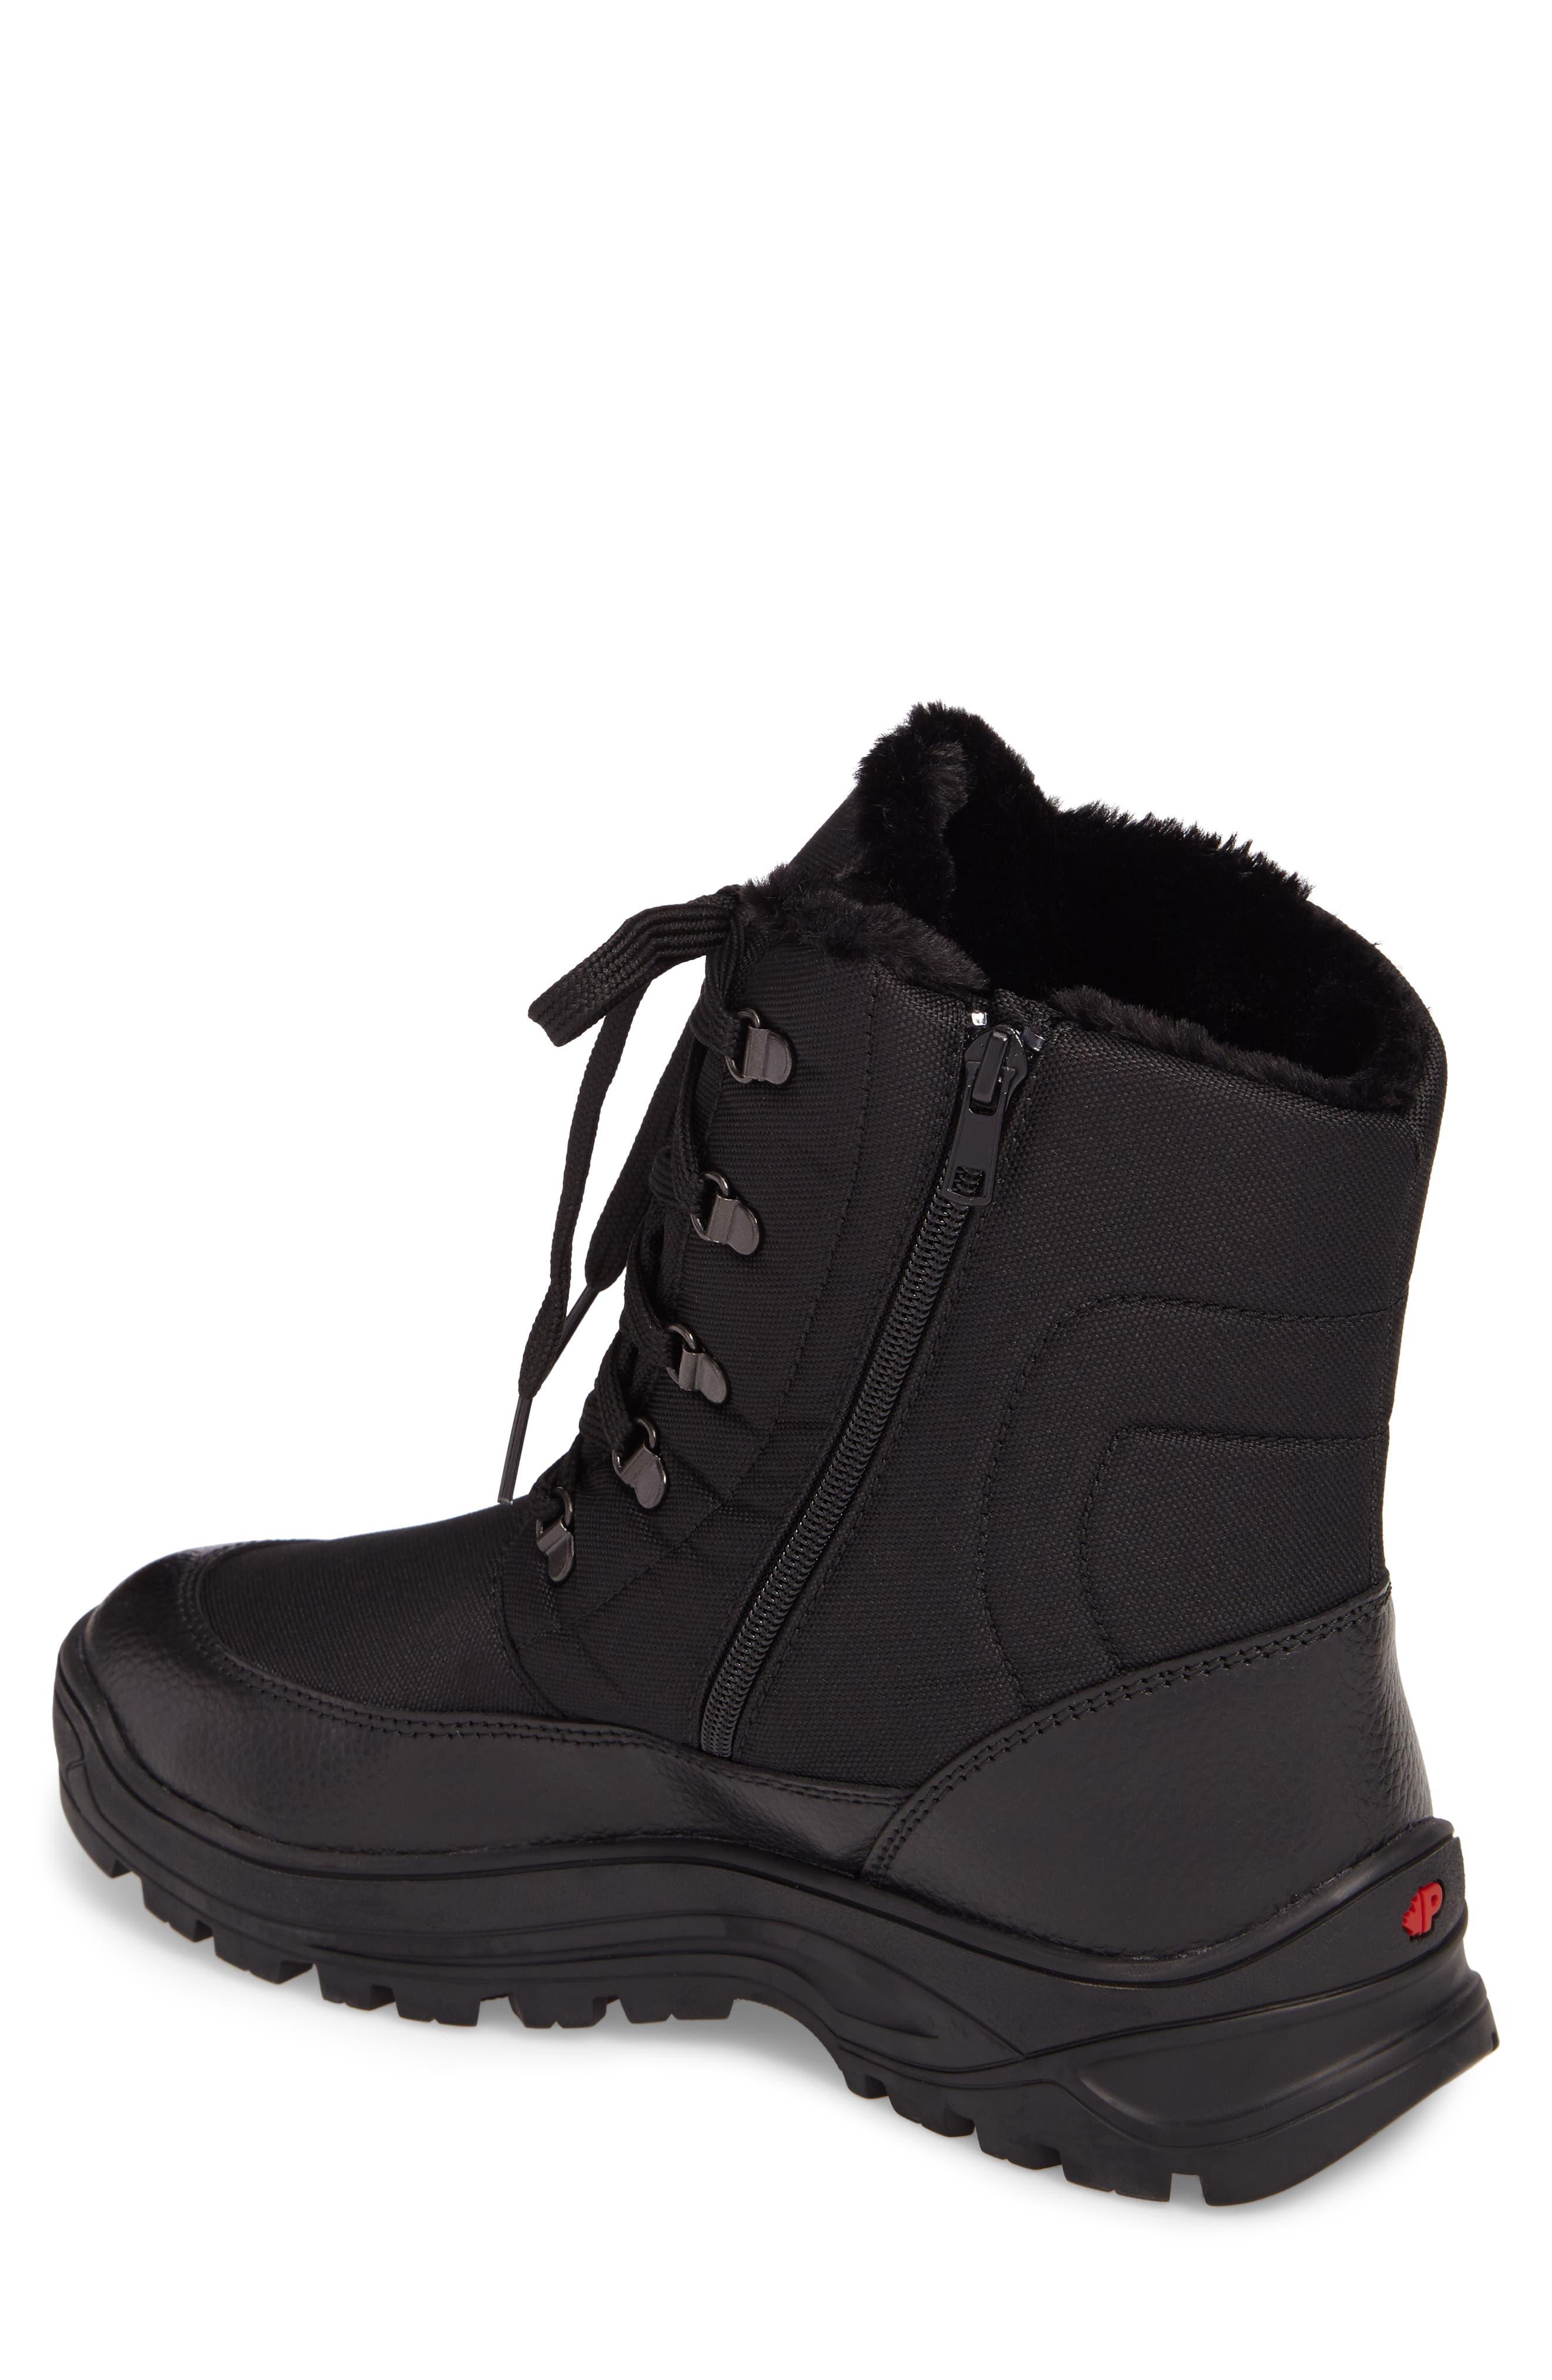 Trigger Winter Waterproof Boot,                             Alternate thumbnail 2, color,                             BLACK